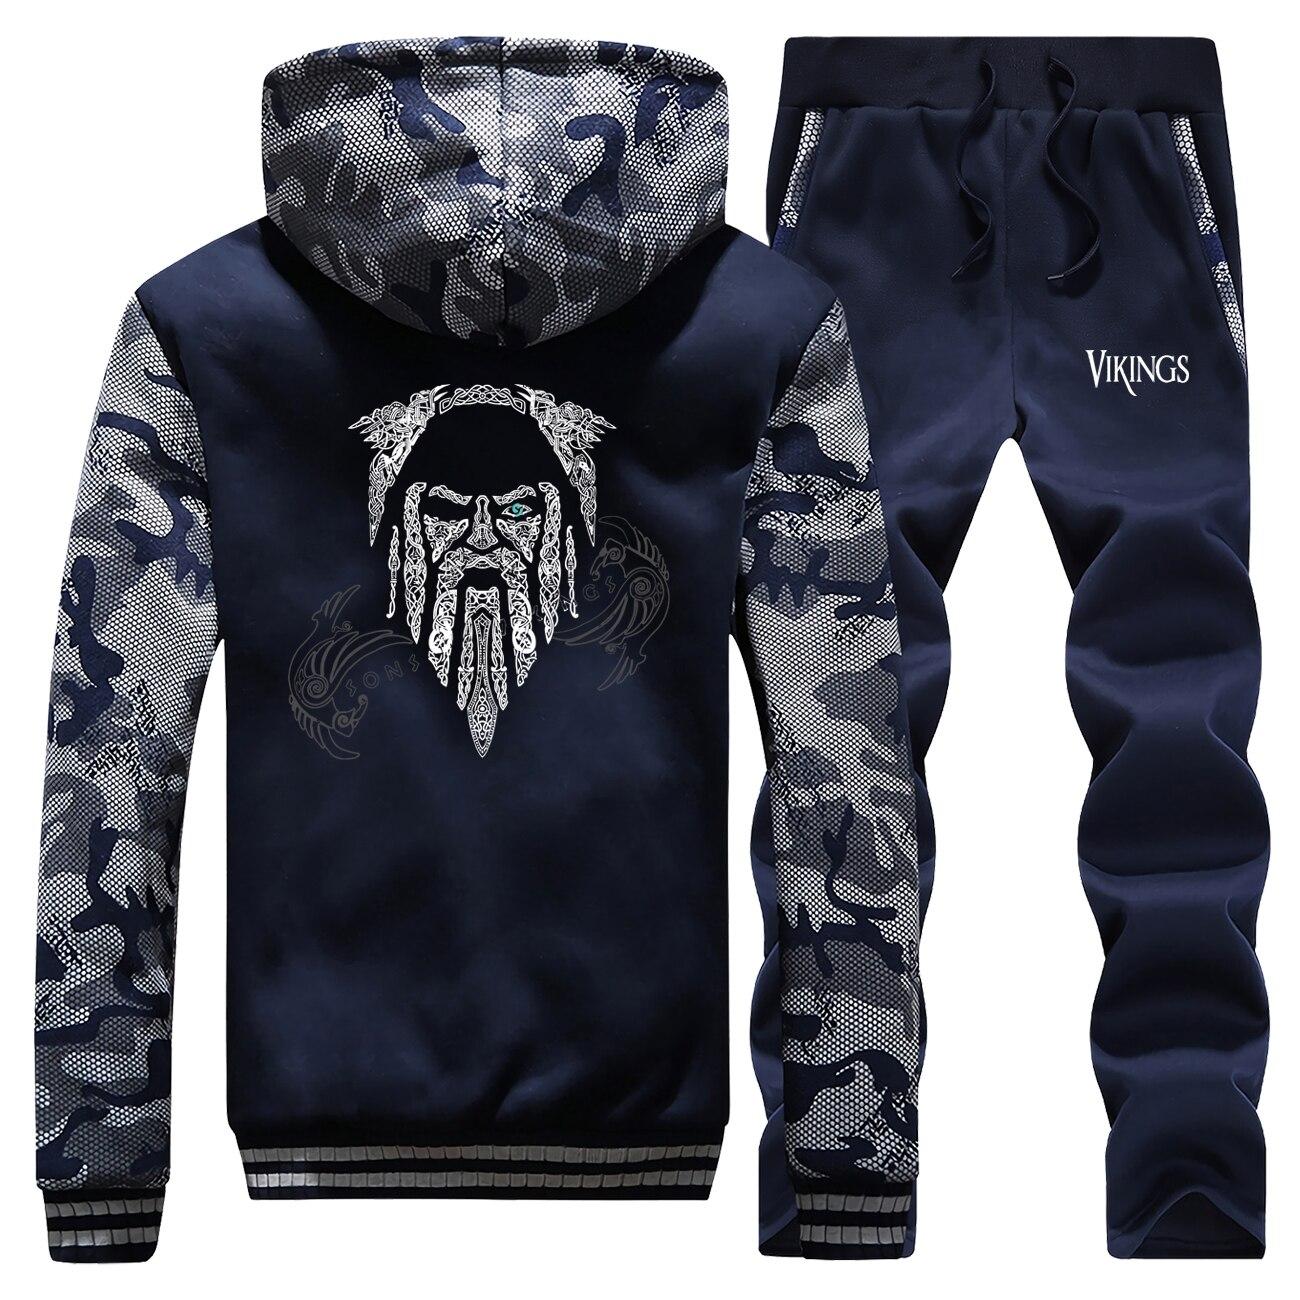 Odin Vikings Hoodies Sweatpants For Men Street Tracksuit Mens Thick Hoodie+Pants 2 Piece Sets Warm Zip Jacket Male Clothing Tops